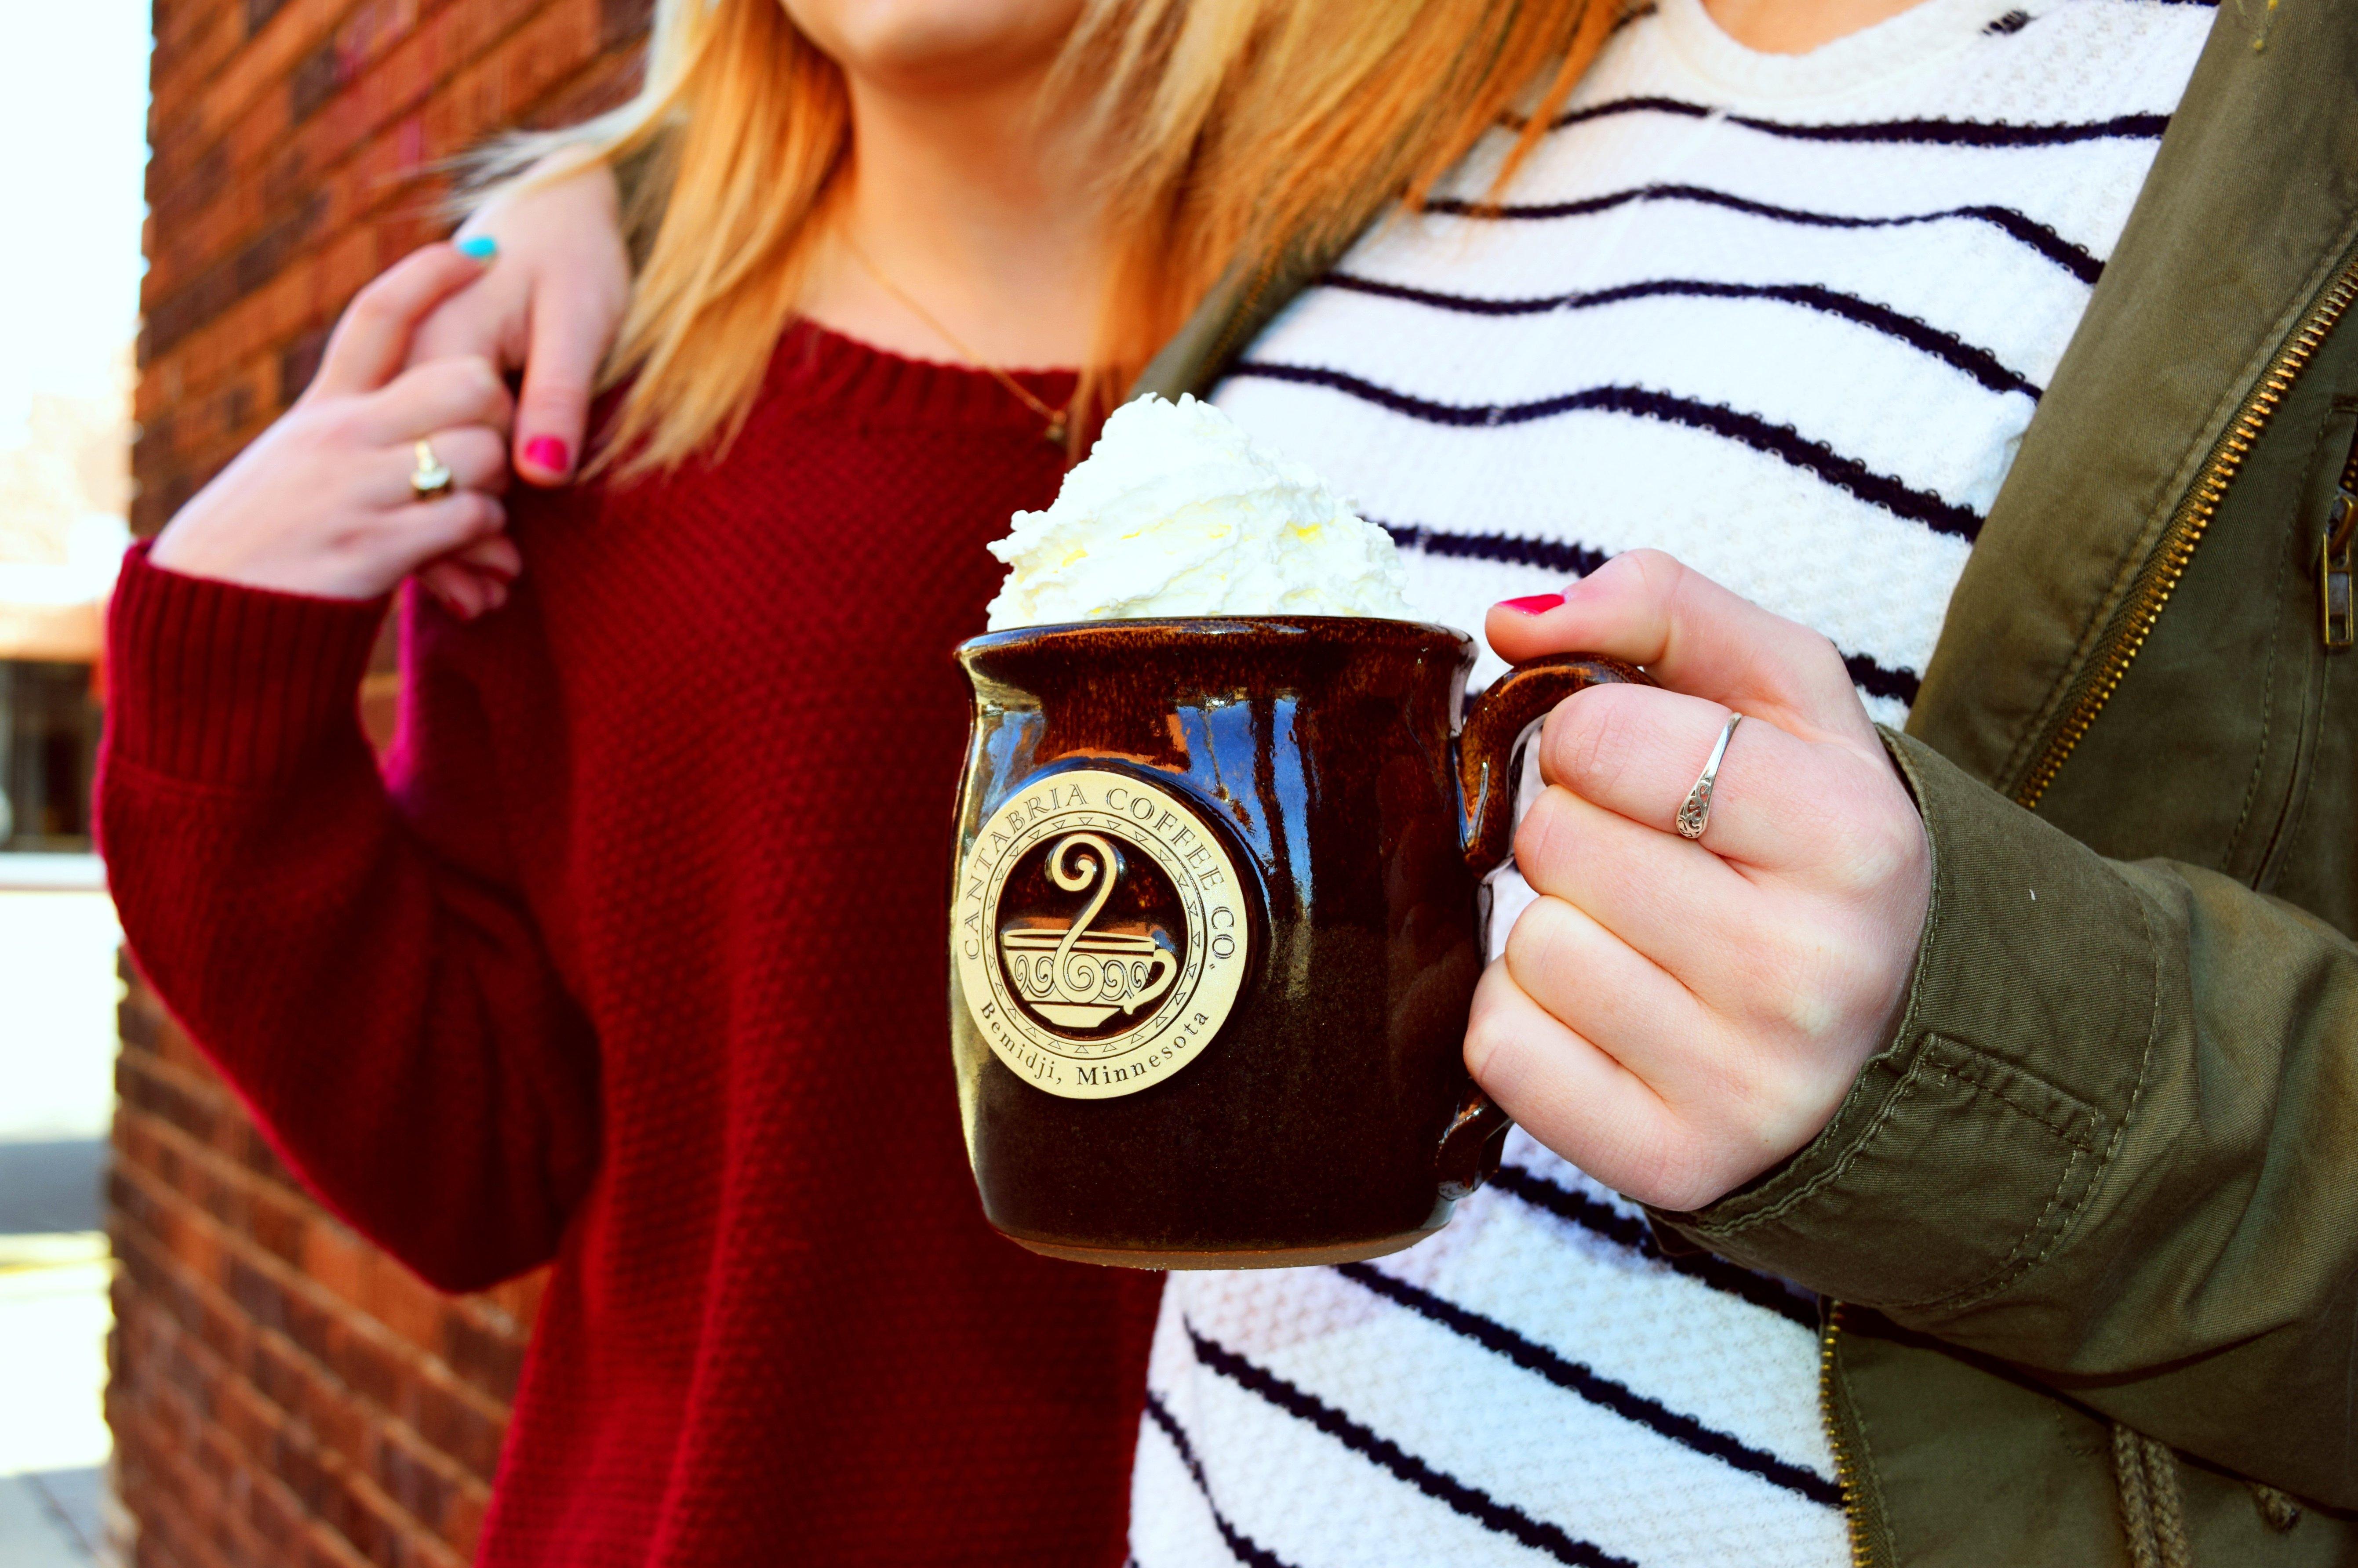 Cantabria Coffee mug with whipped cream